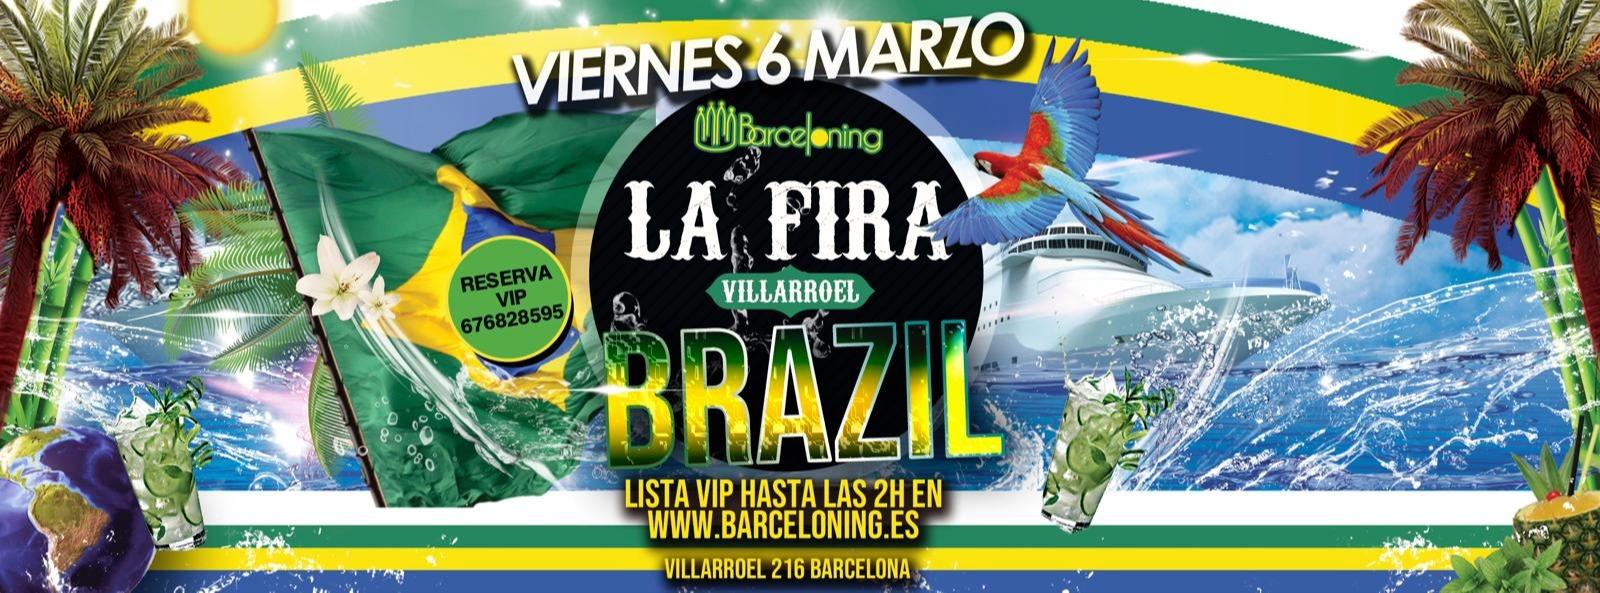 FIESTA BRASILERA - LA FIRA VILLARROEL - Club LA FIRA VILLARROEL